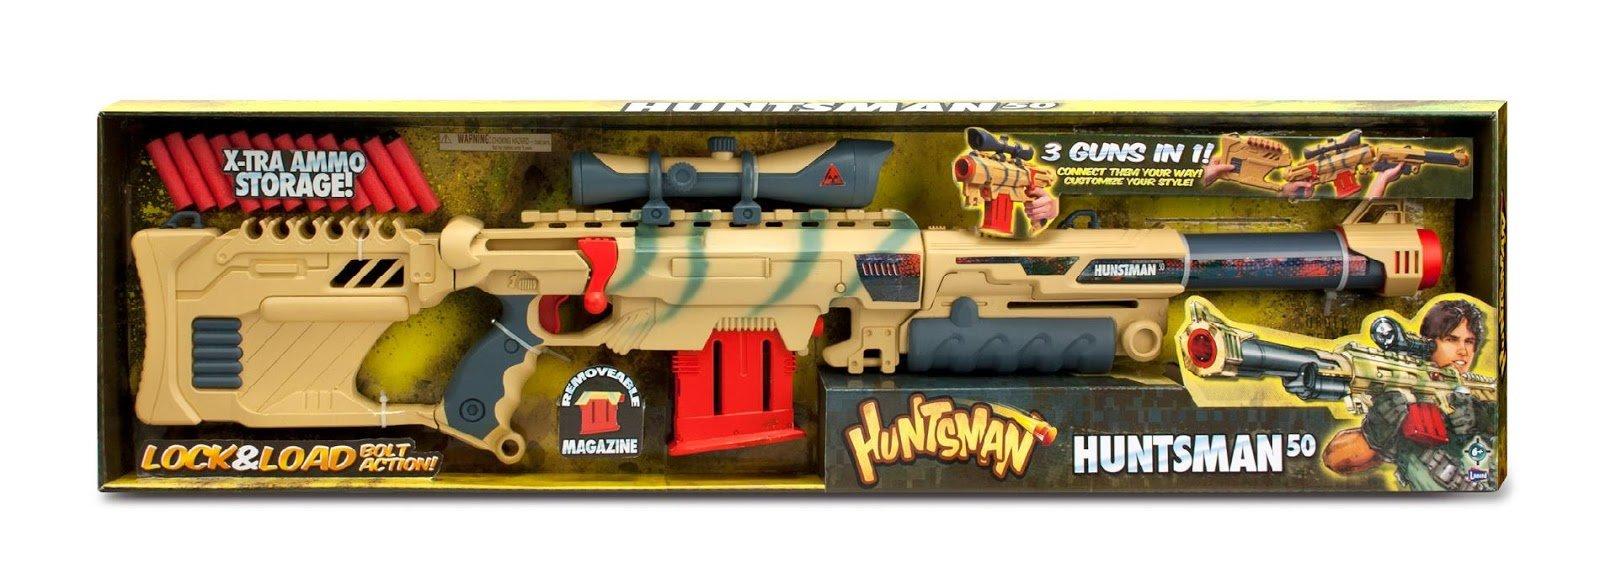 Huntsman 50